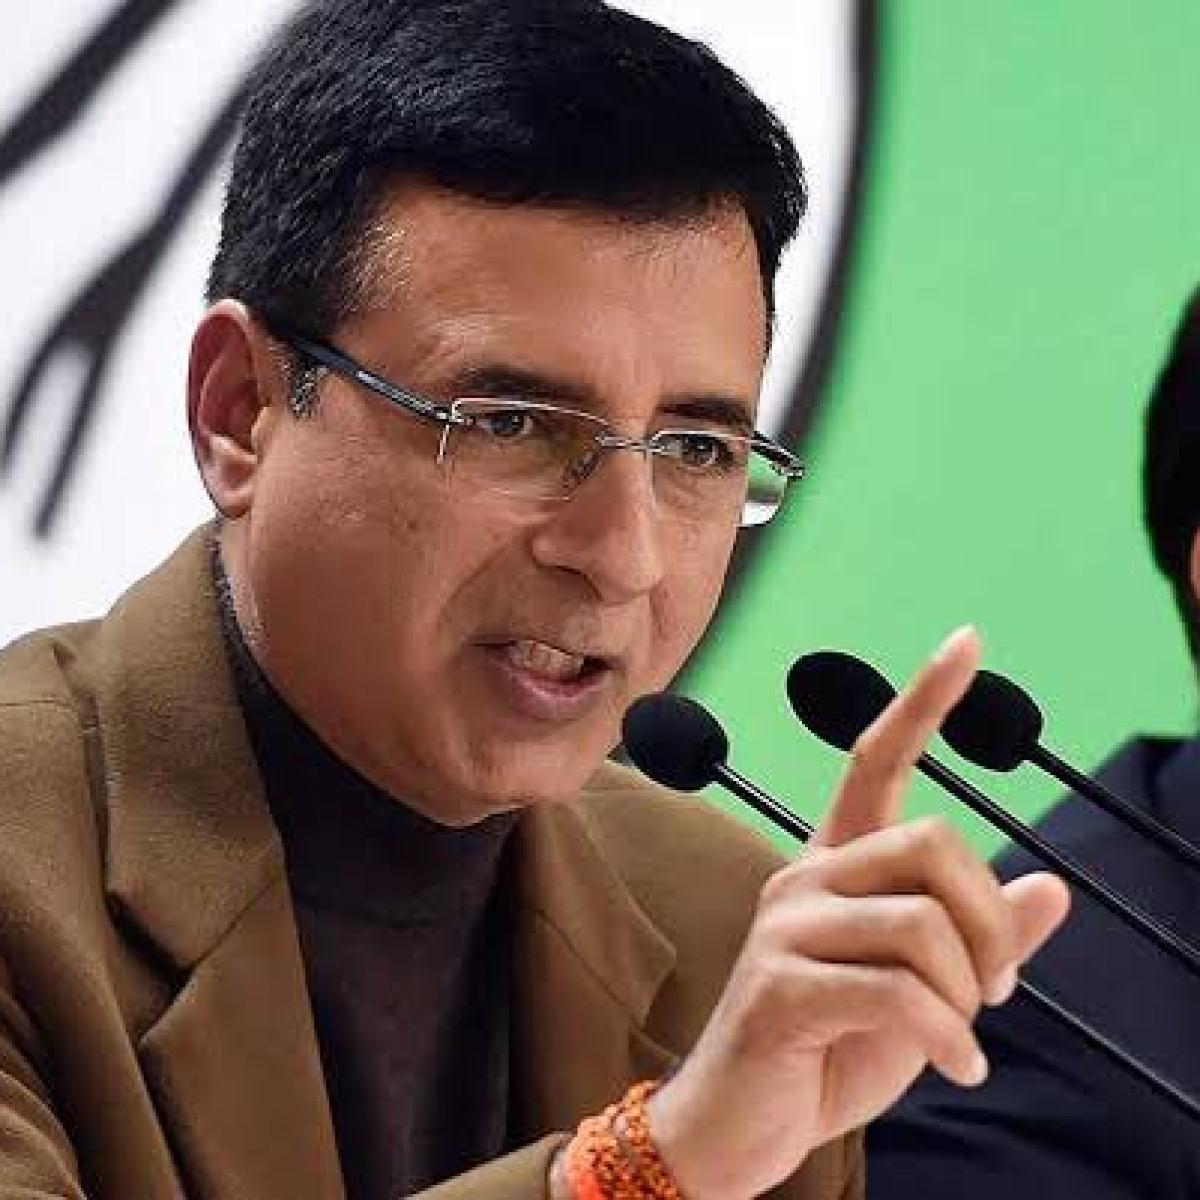 MPLAD suspension a huge disservice to constituents: Congress' Randeep Singh Surjewala criticises Modi govt